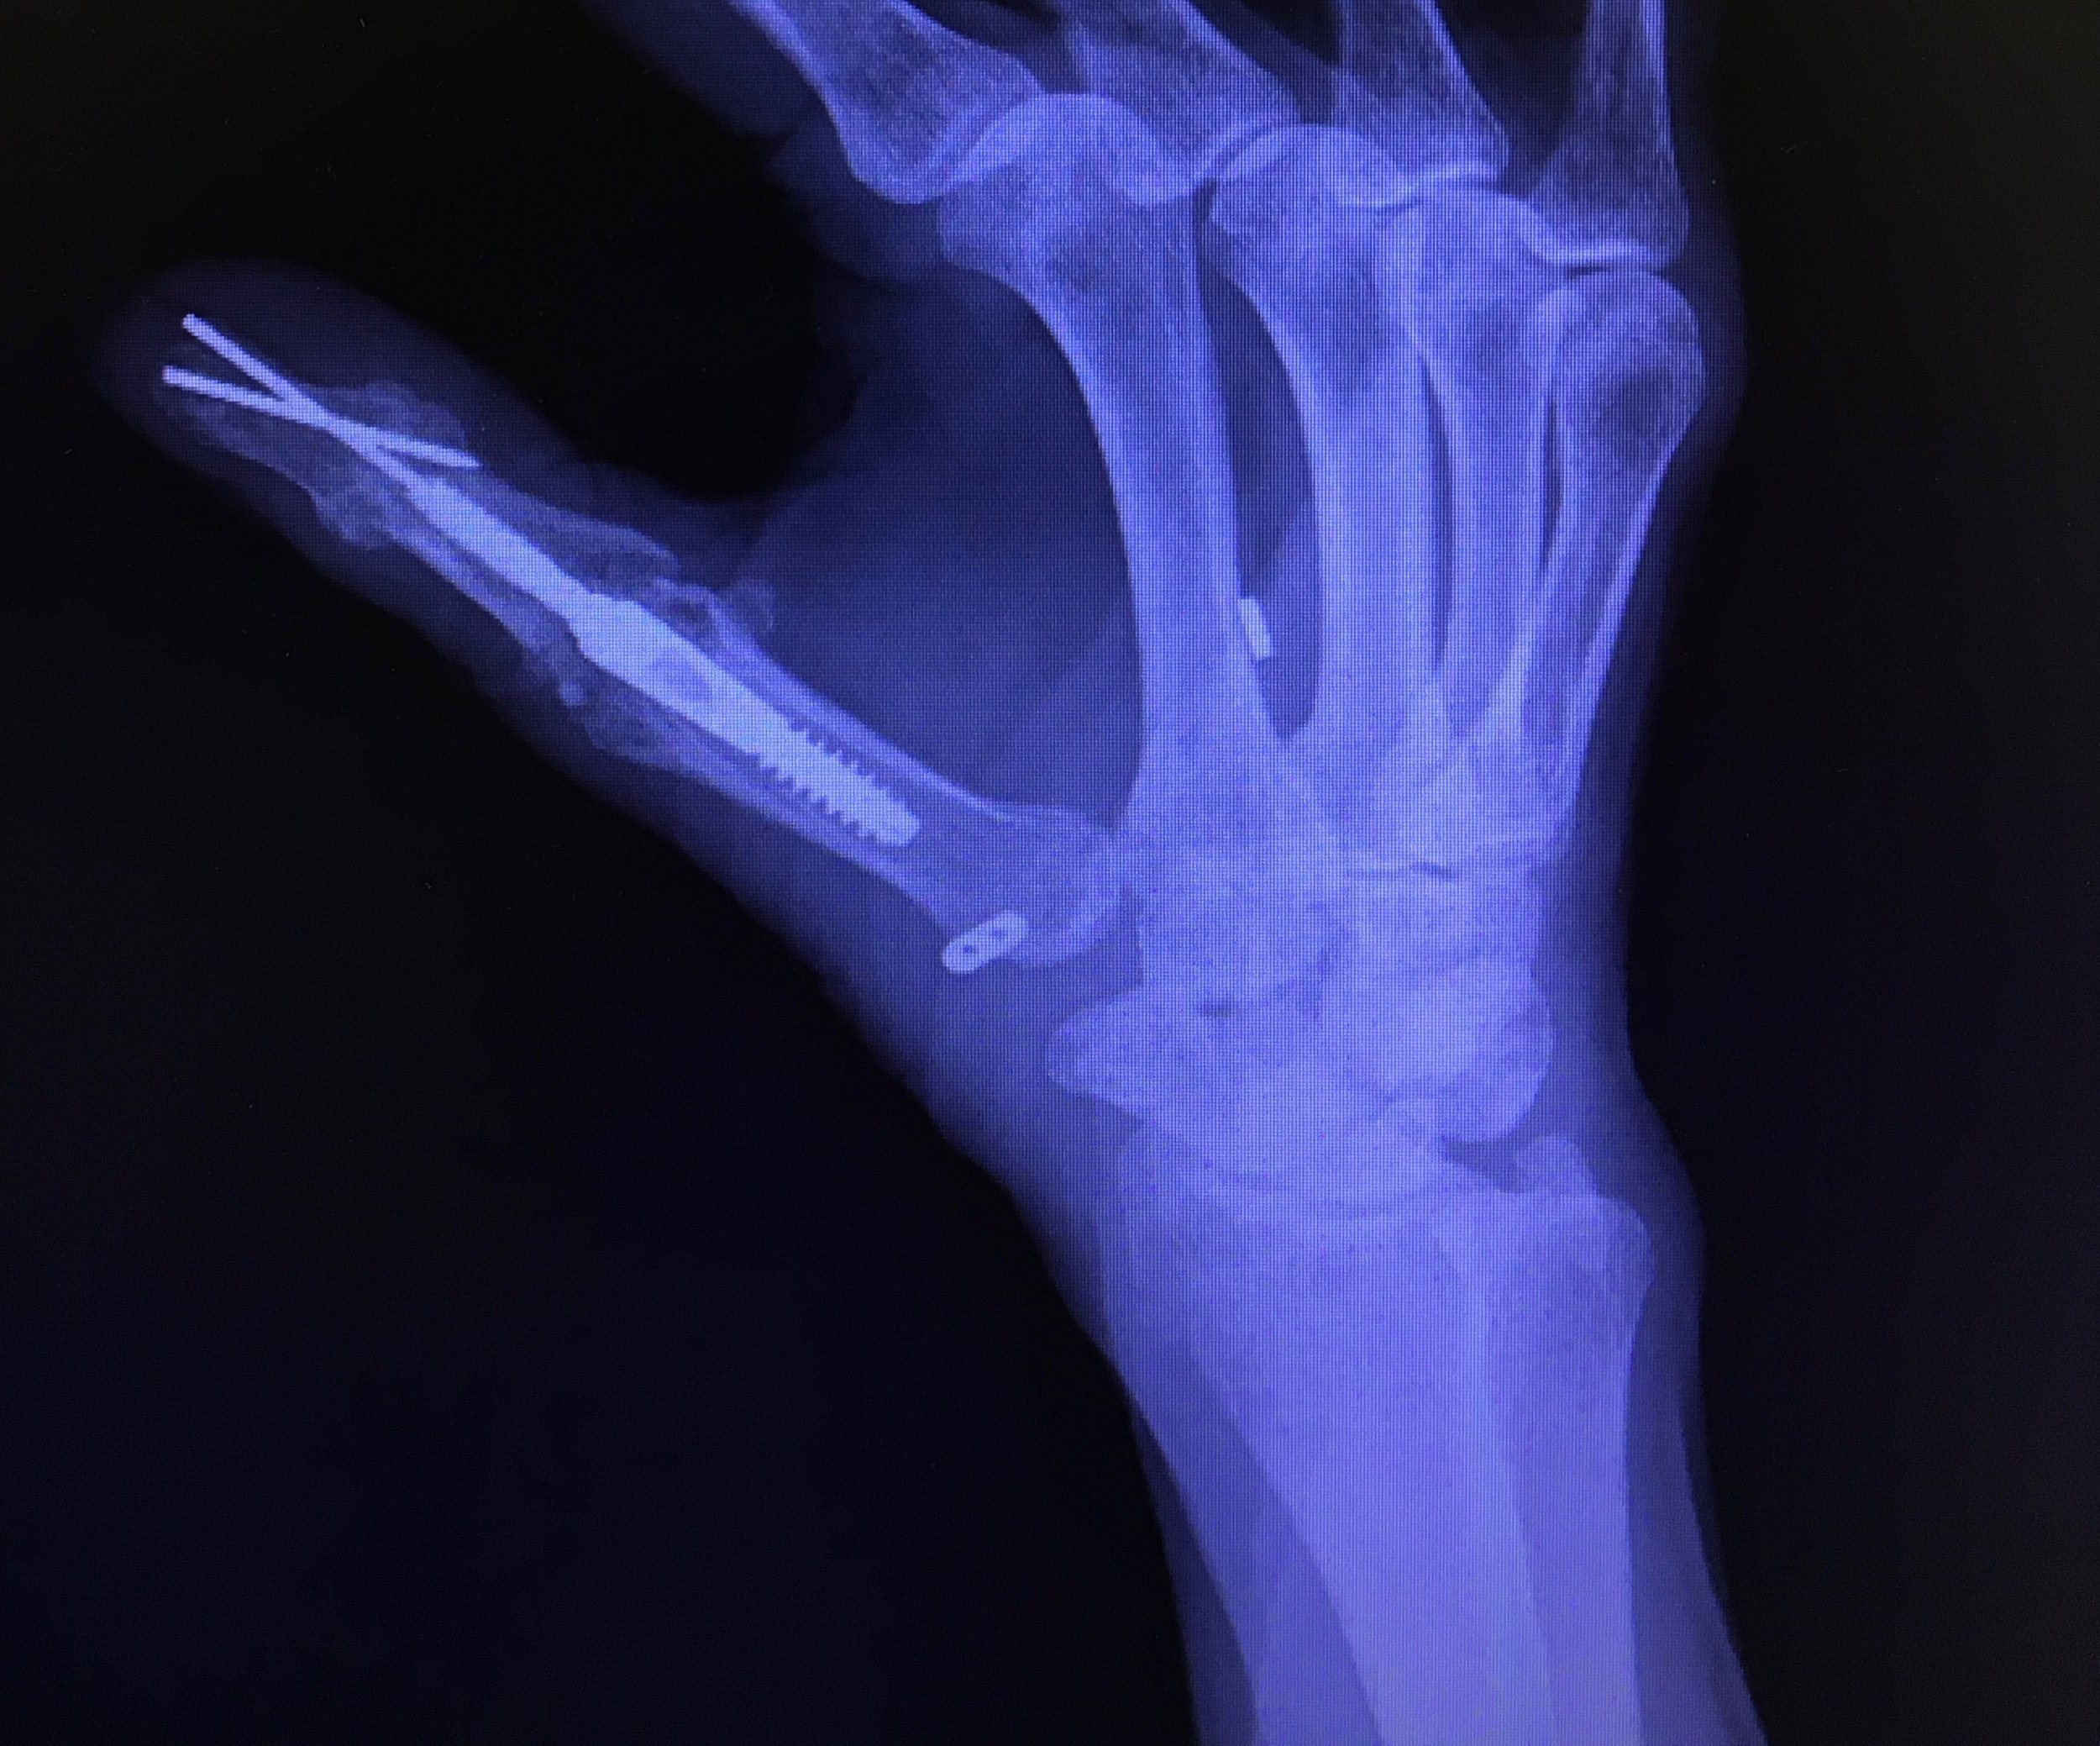 Postop - Arthritis Hand